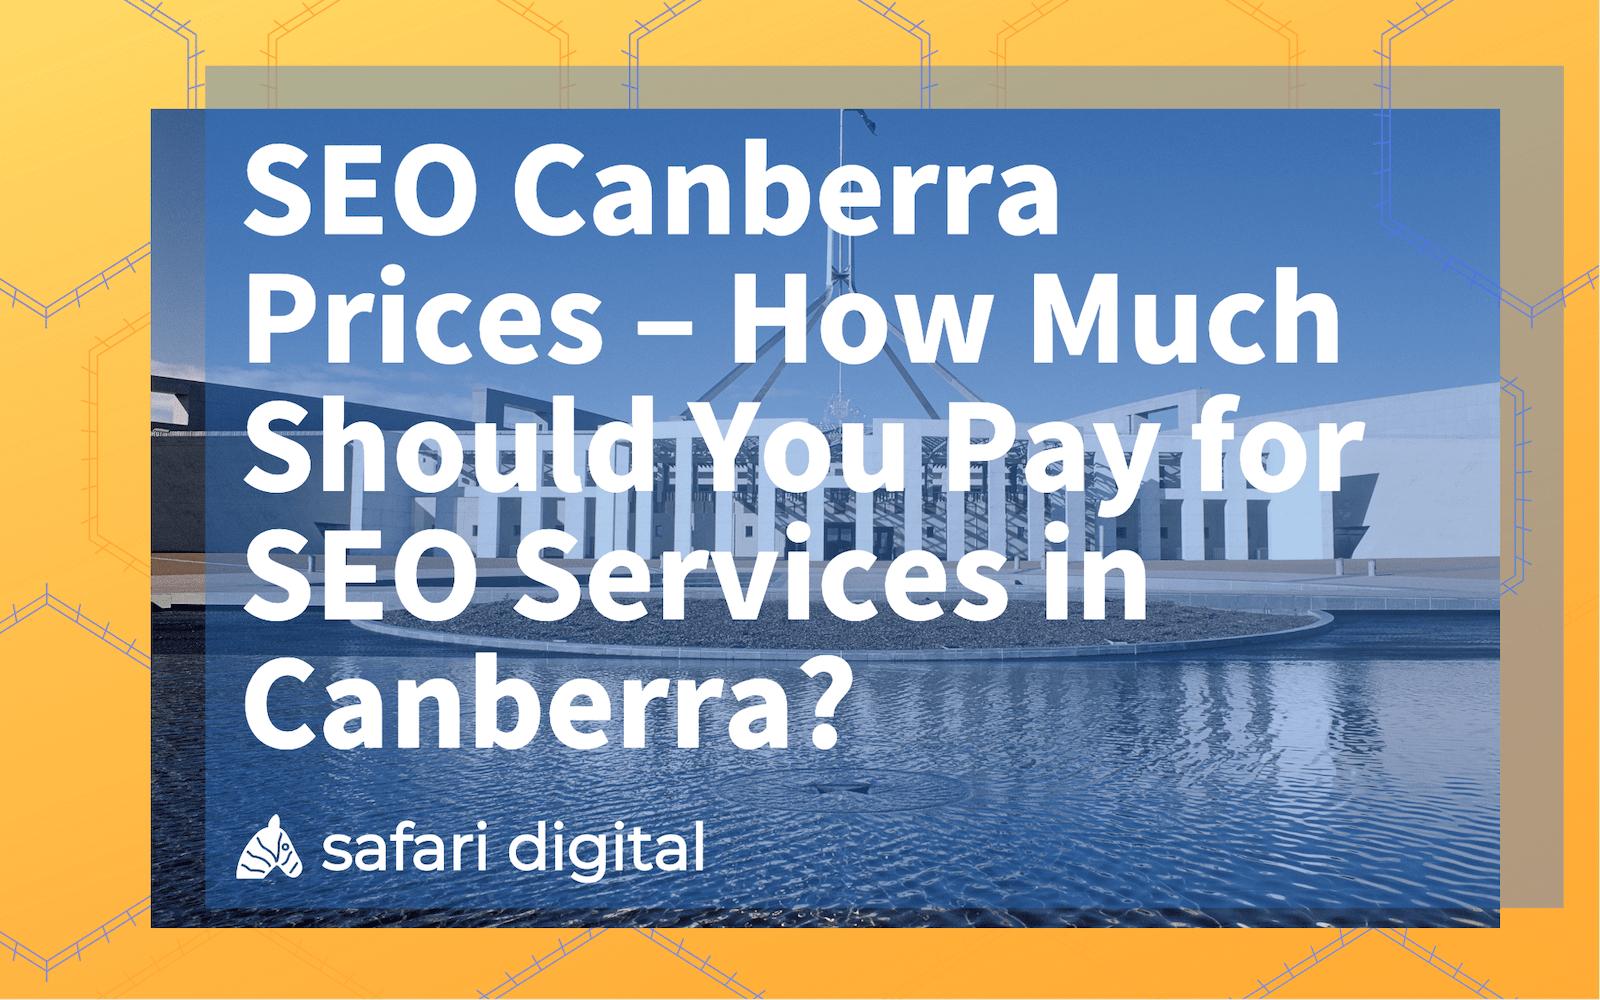 seo canberra prices safari digital cover image large